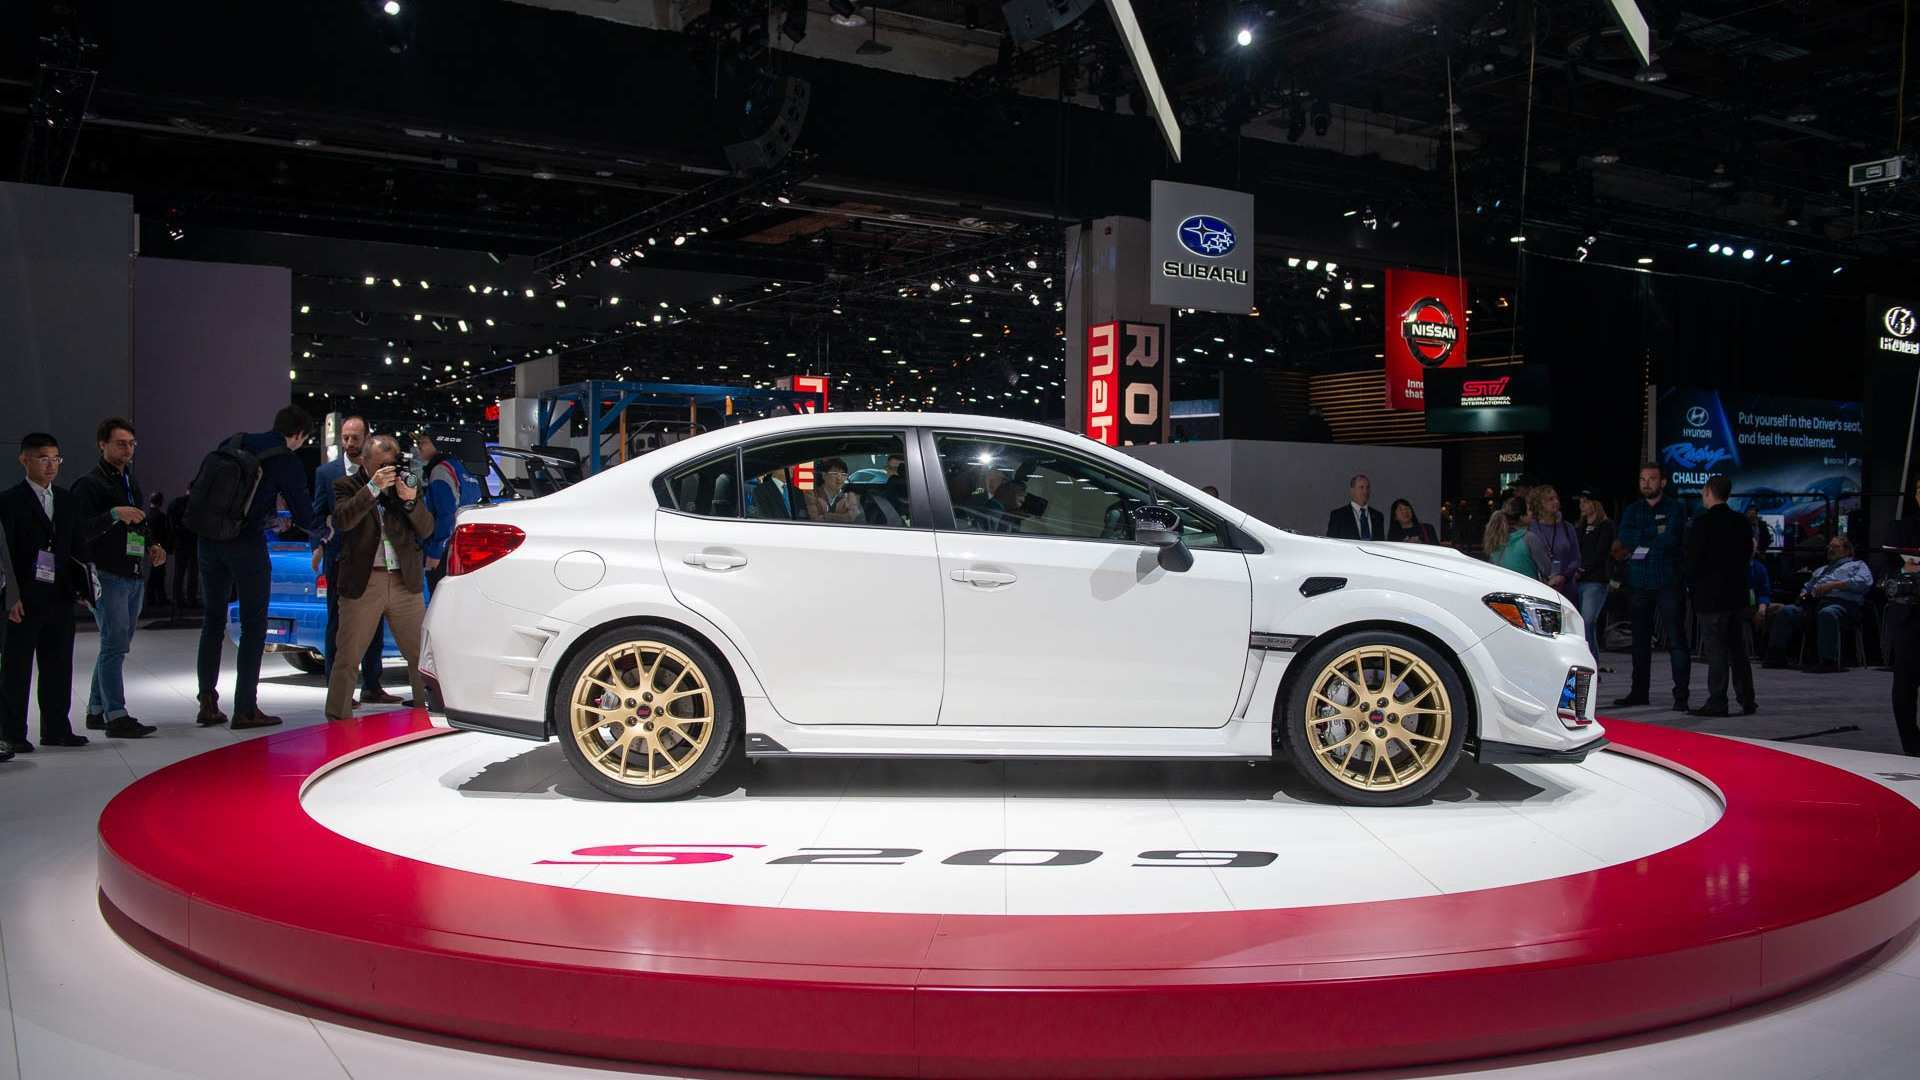 54 Concept of Subaru Wrx 2020 Price for Subaru Wrx 2020